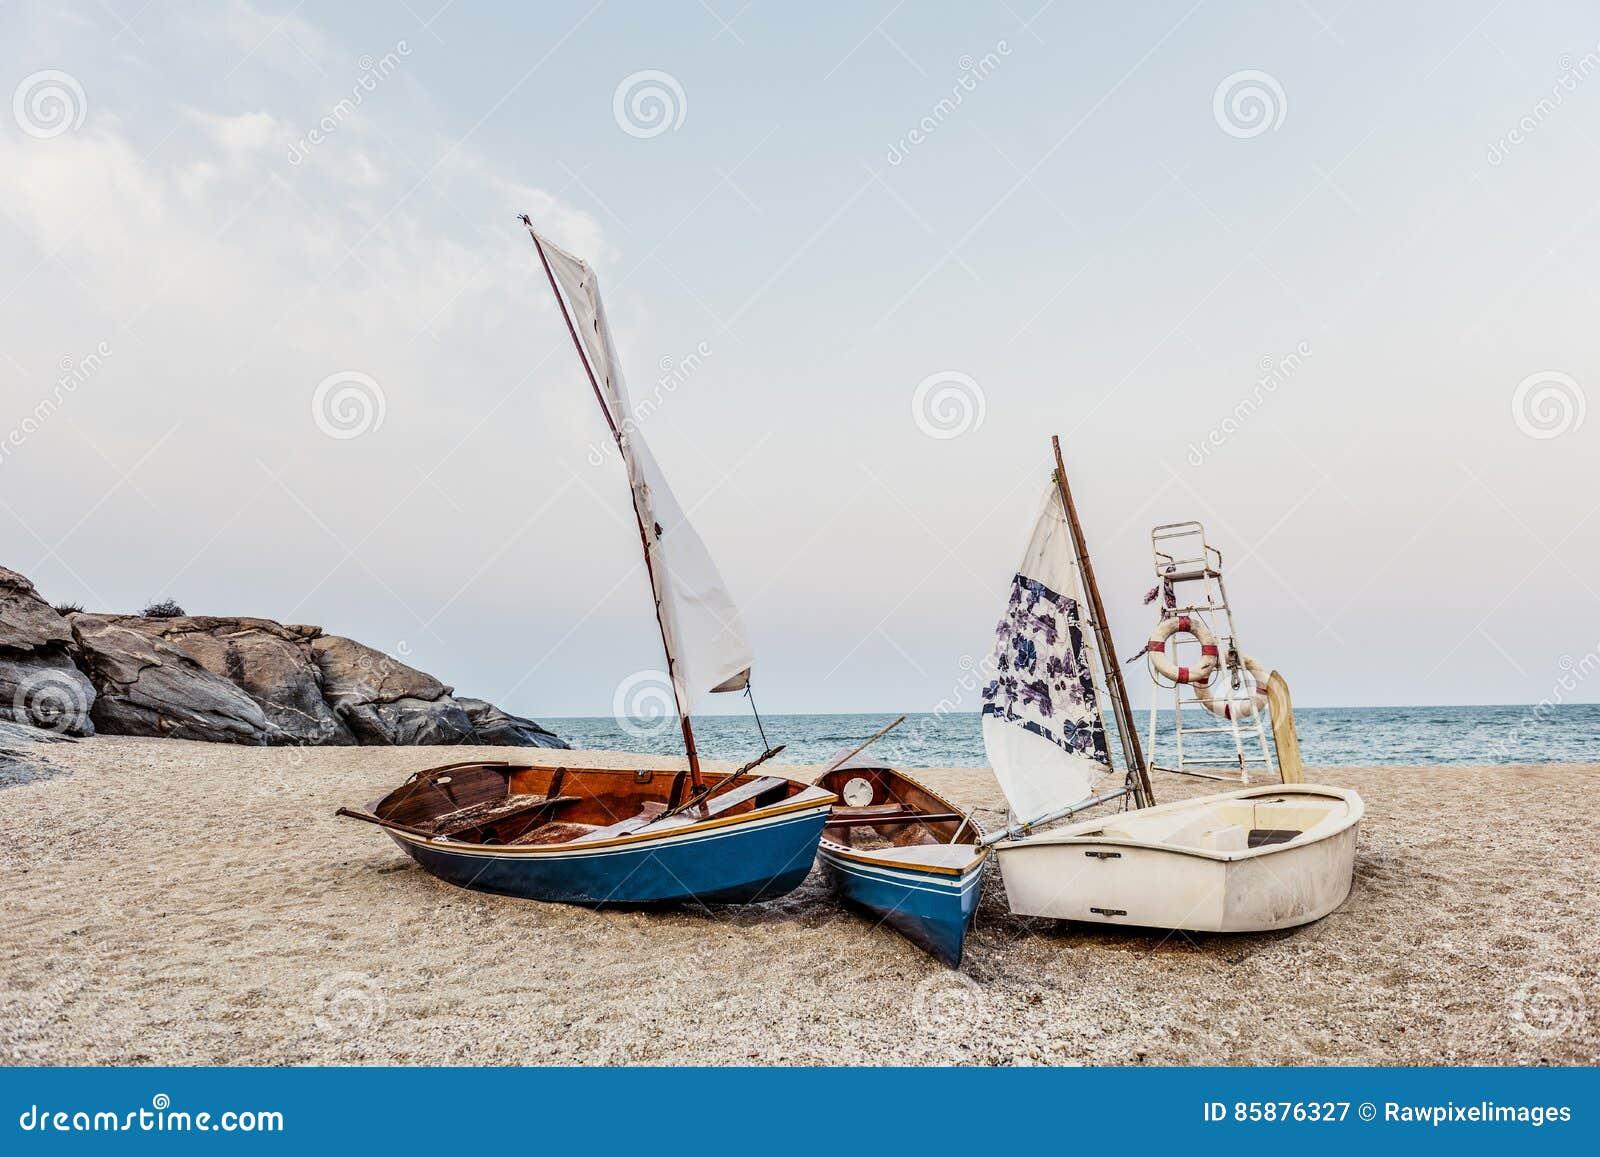 Sail Boats Sea Shore Lifesaver Flotation Life Buoy Rock Formation Concept